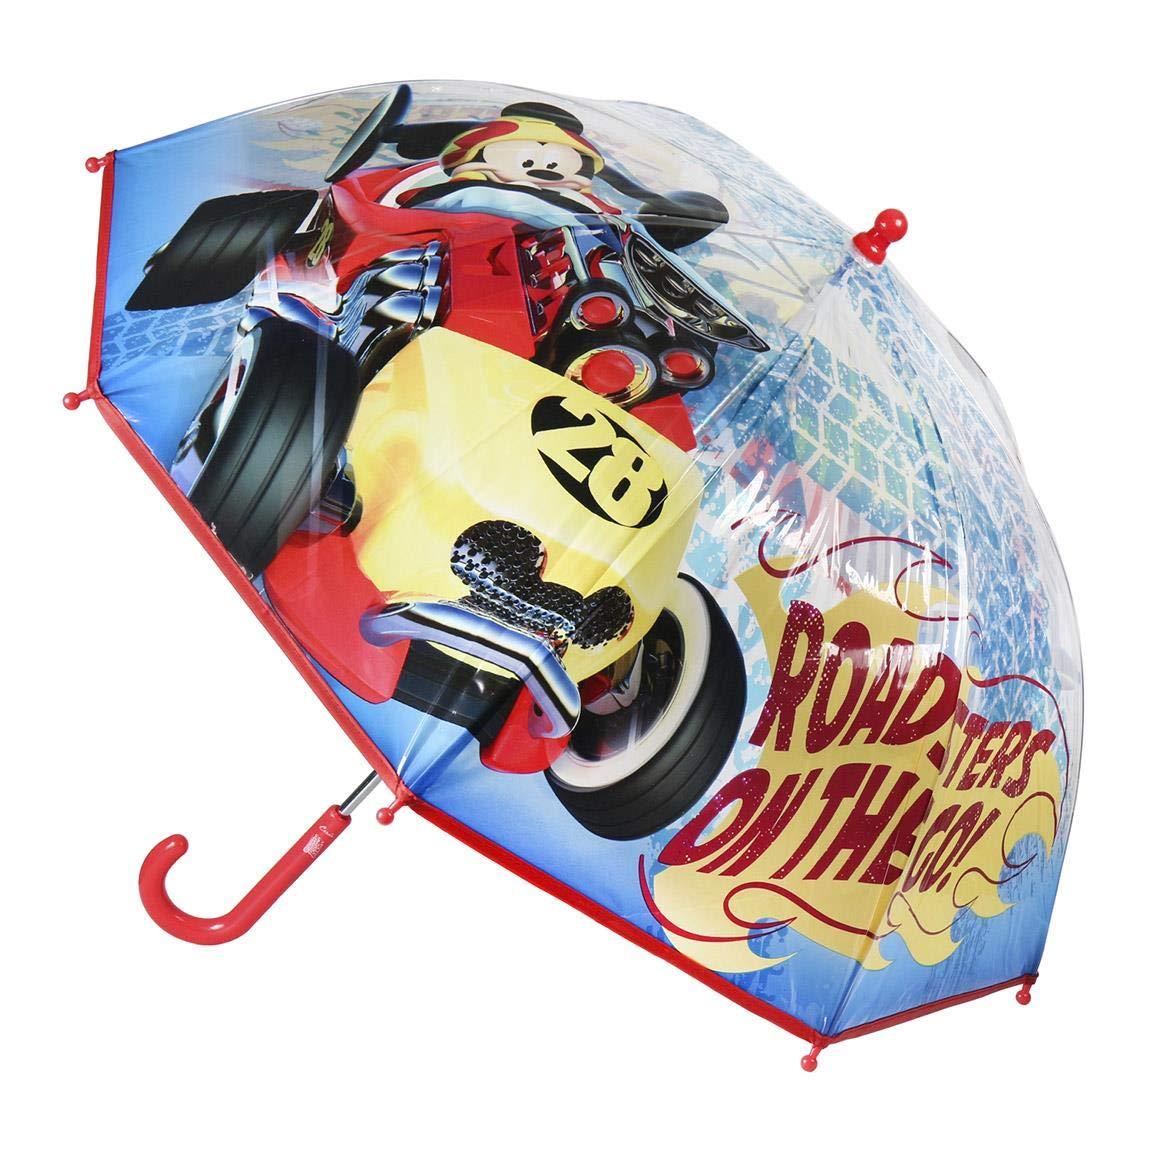 Cerd/á 2400000401 Parapluie Multicolore Multicolor 001 3 Gar/çon